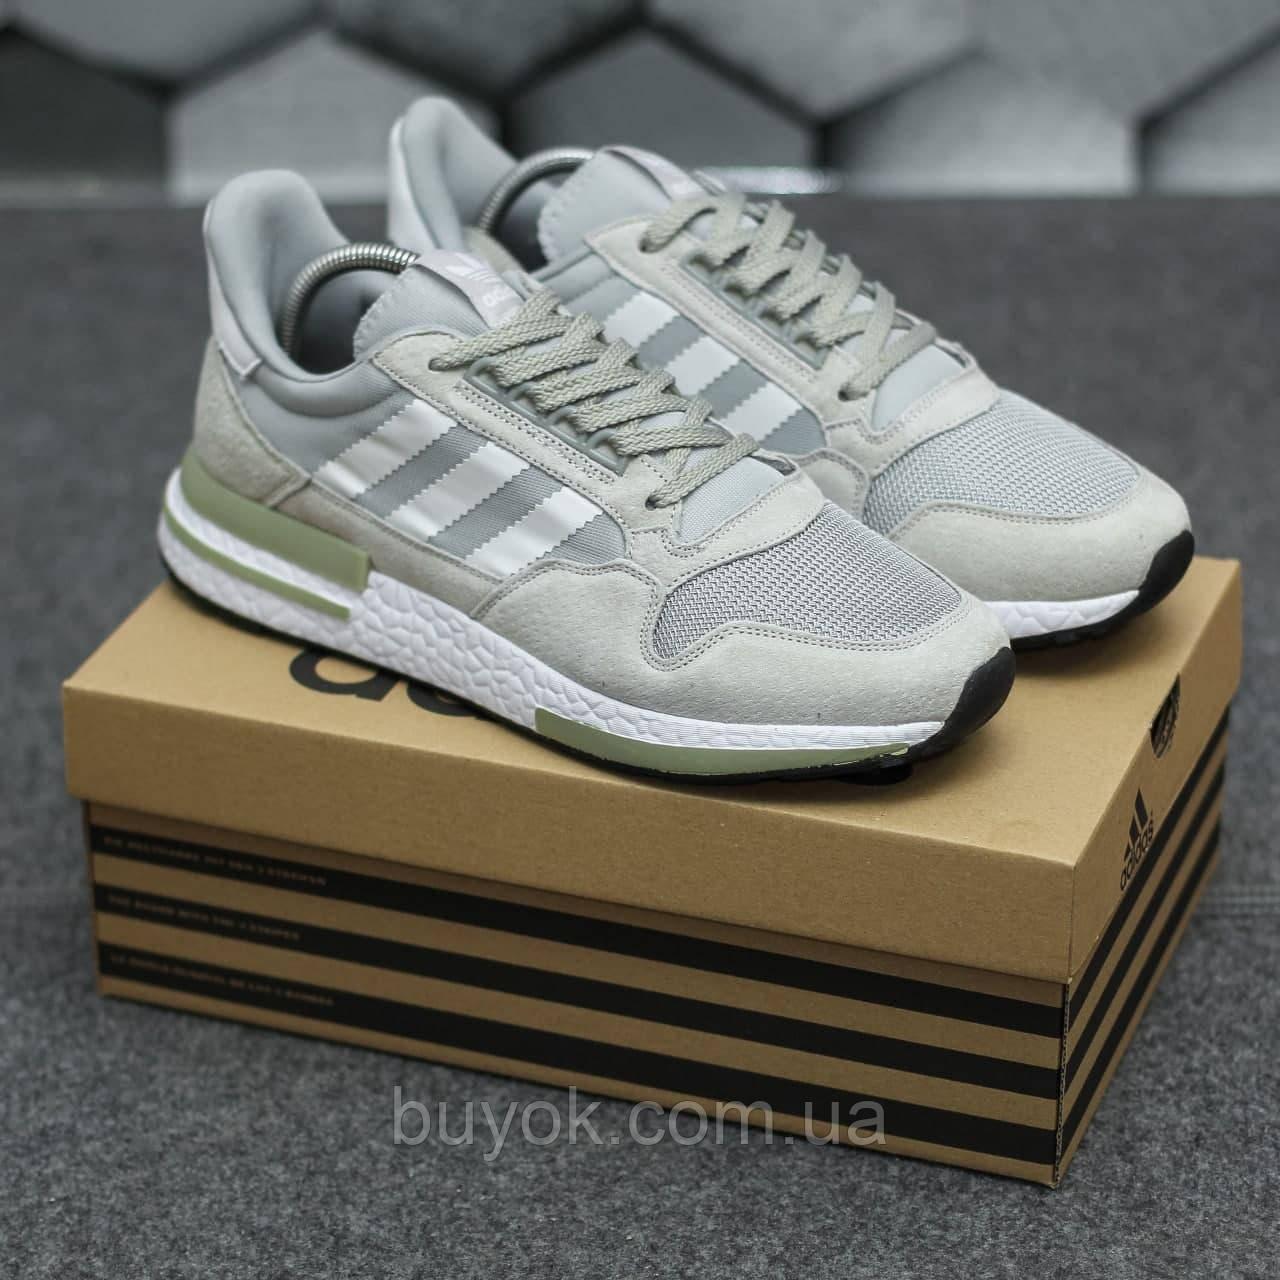 Мужские кроссовки Adidas ZX500 RM Grey ALL05956